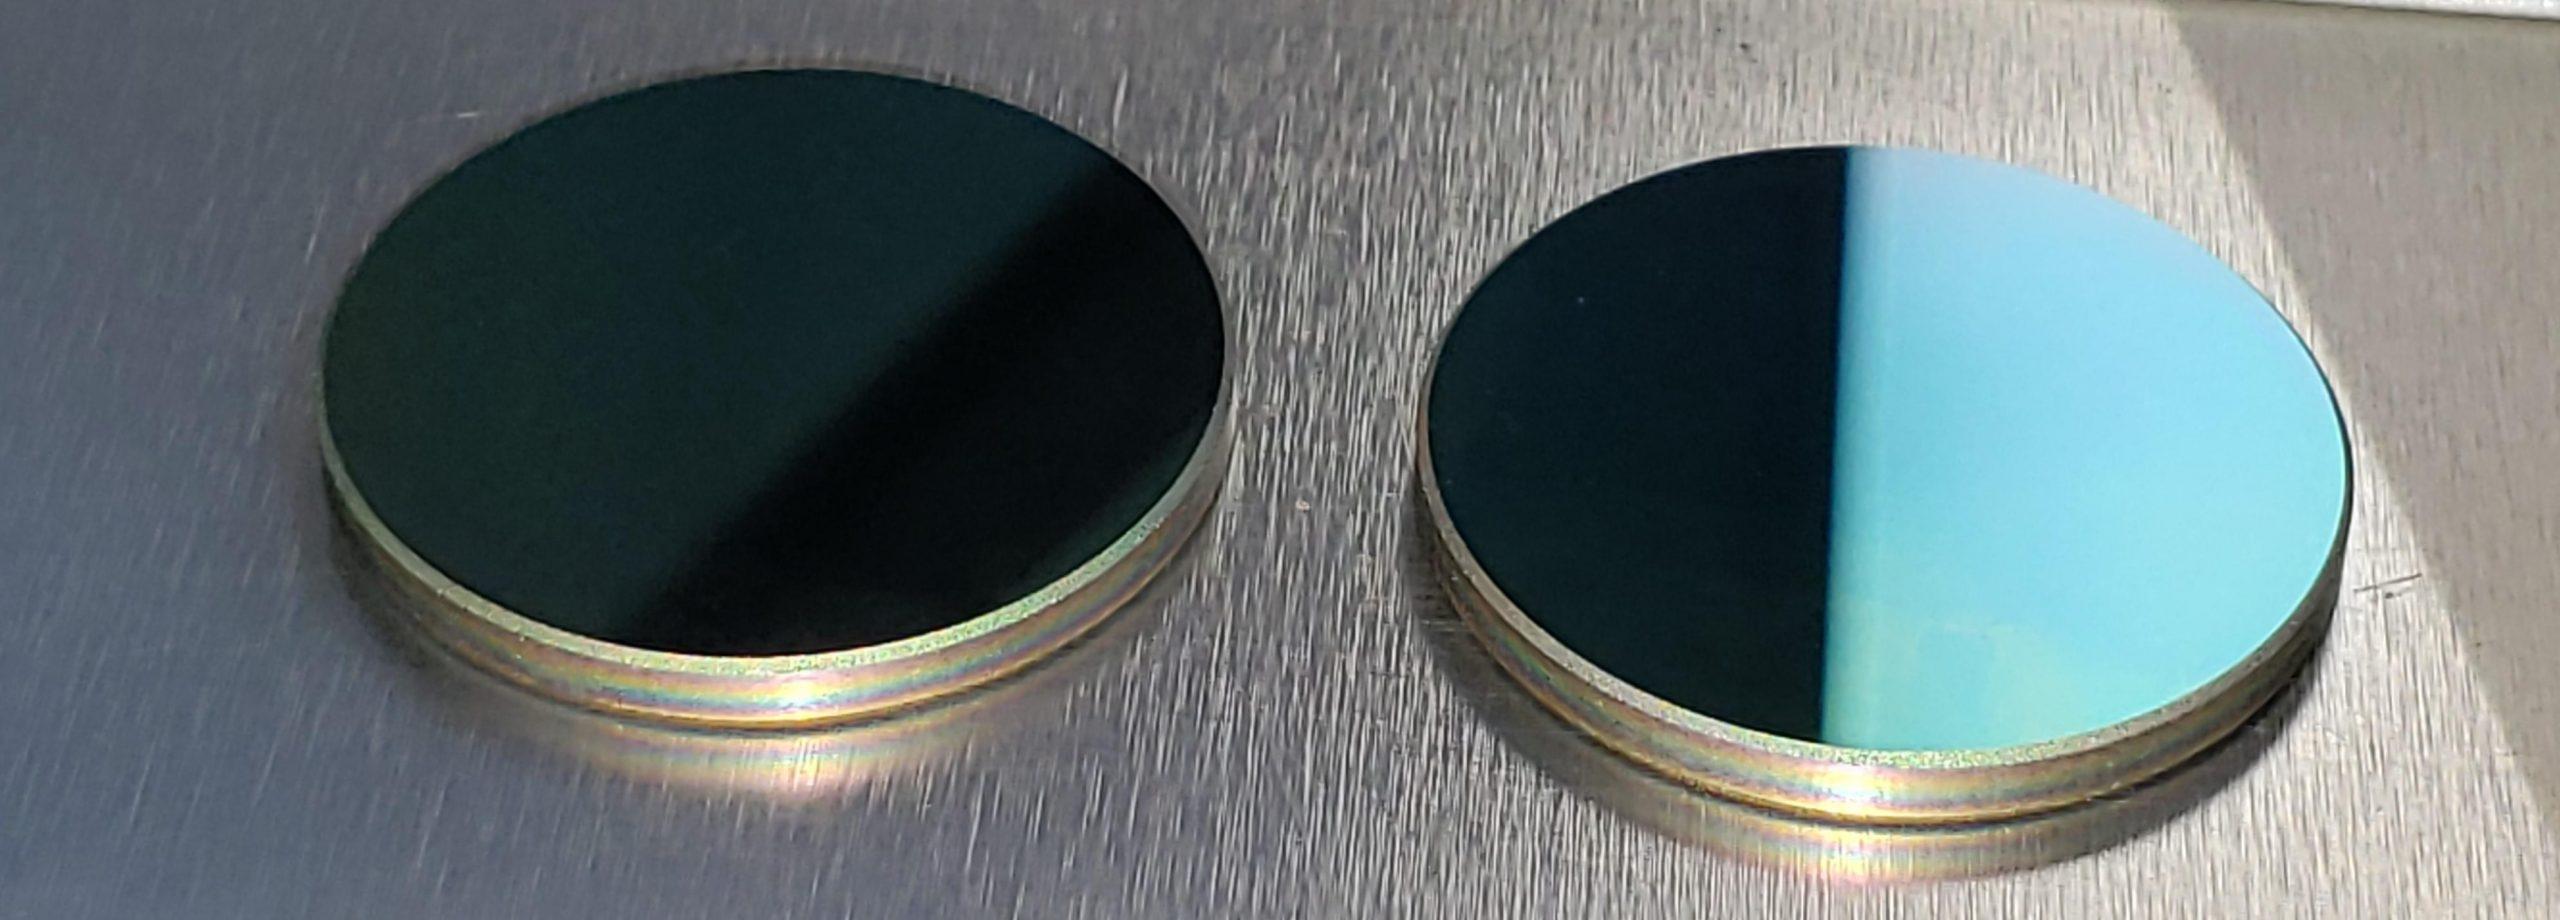 AKHAN Miraj Diamond Optics